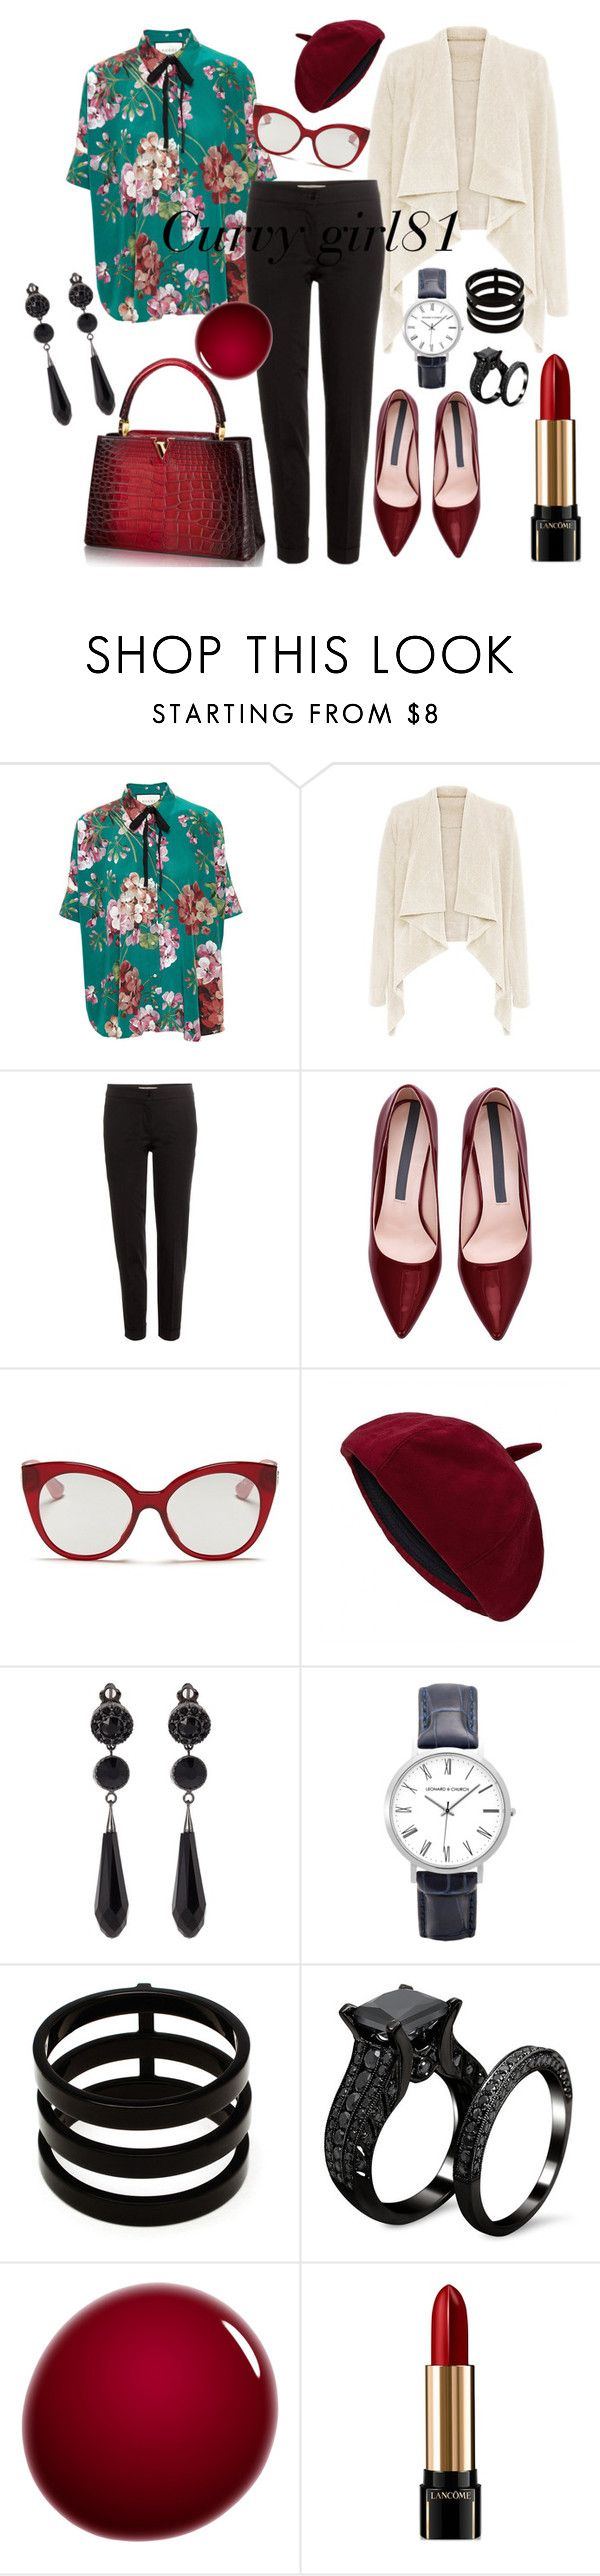 """pretty red flowers"" by pretty-girl81 on Polyvore featuring moda, Gucci, Etro, Miu Miu, Givenchy, Repossi, NARS Cosmetics, Lancôme, women's clothing e women"